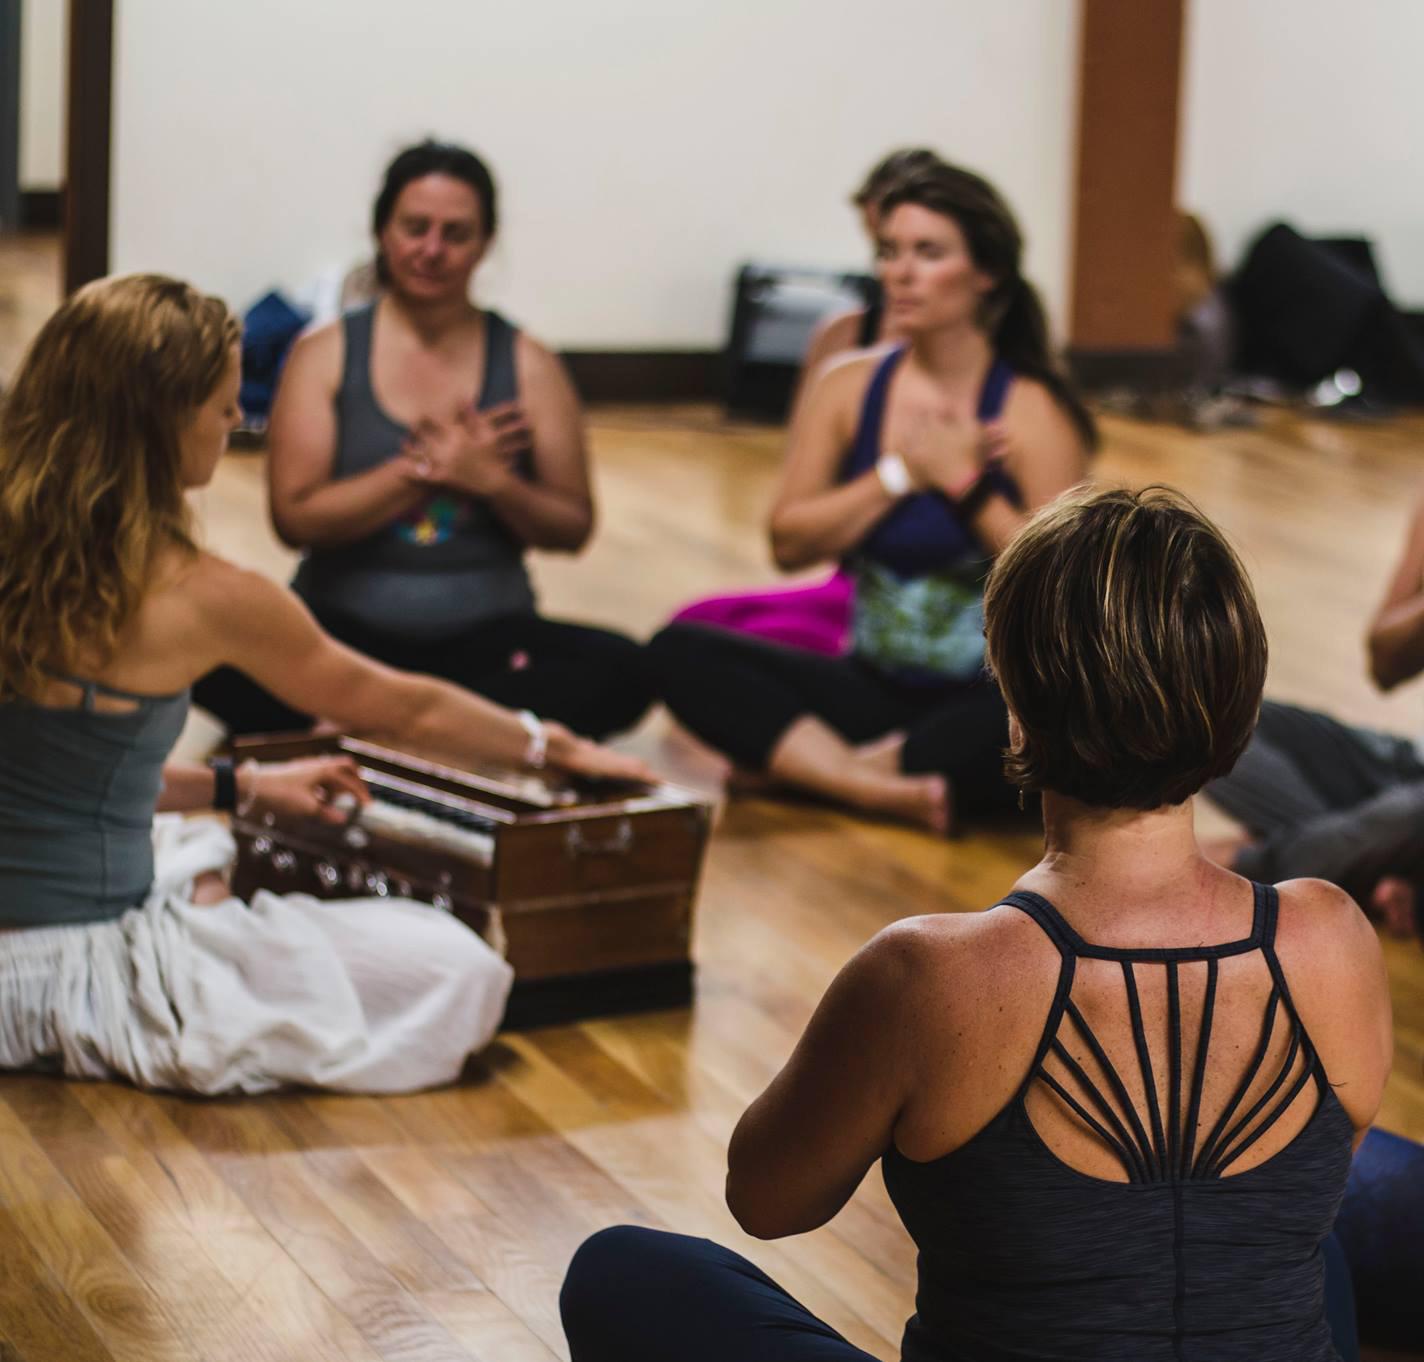 yoga-iowa-images.jpg